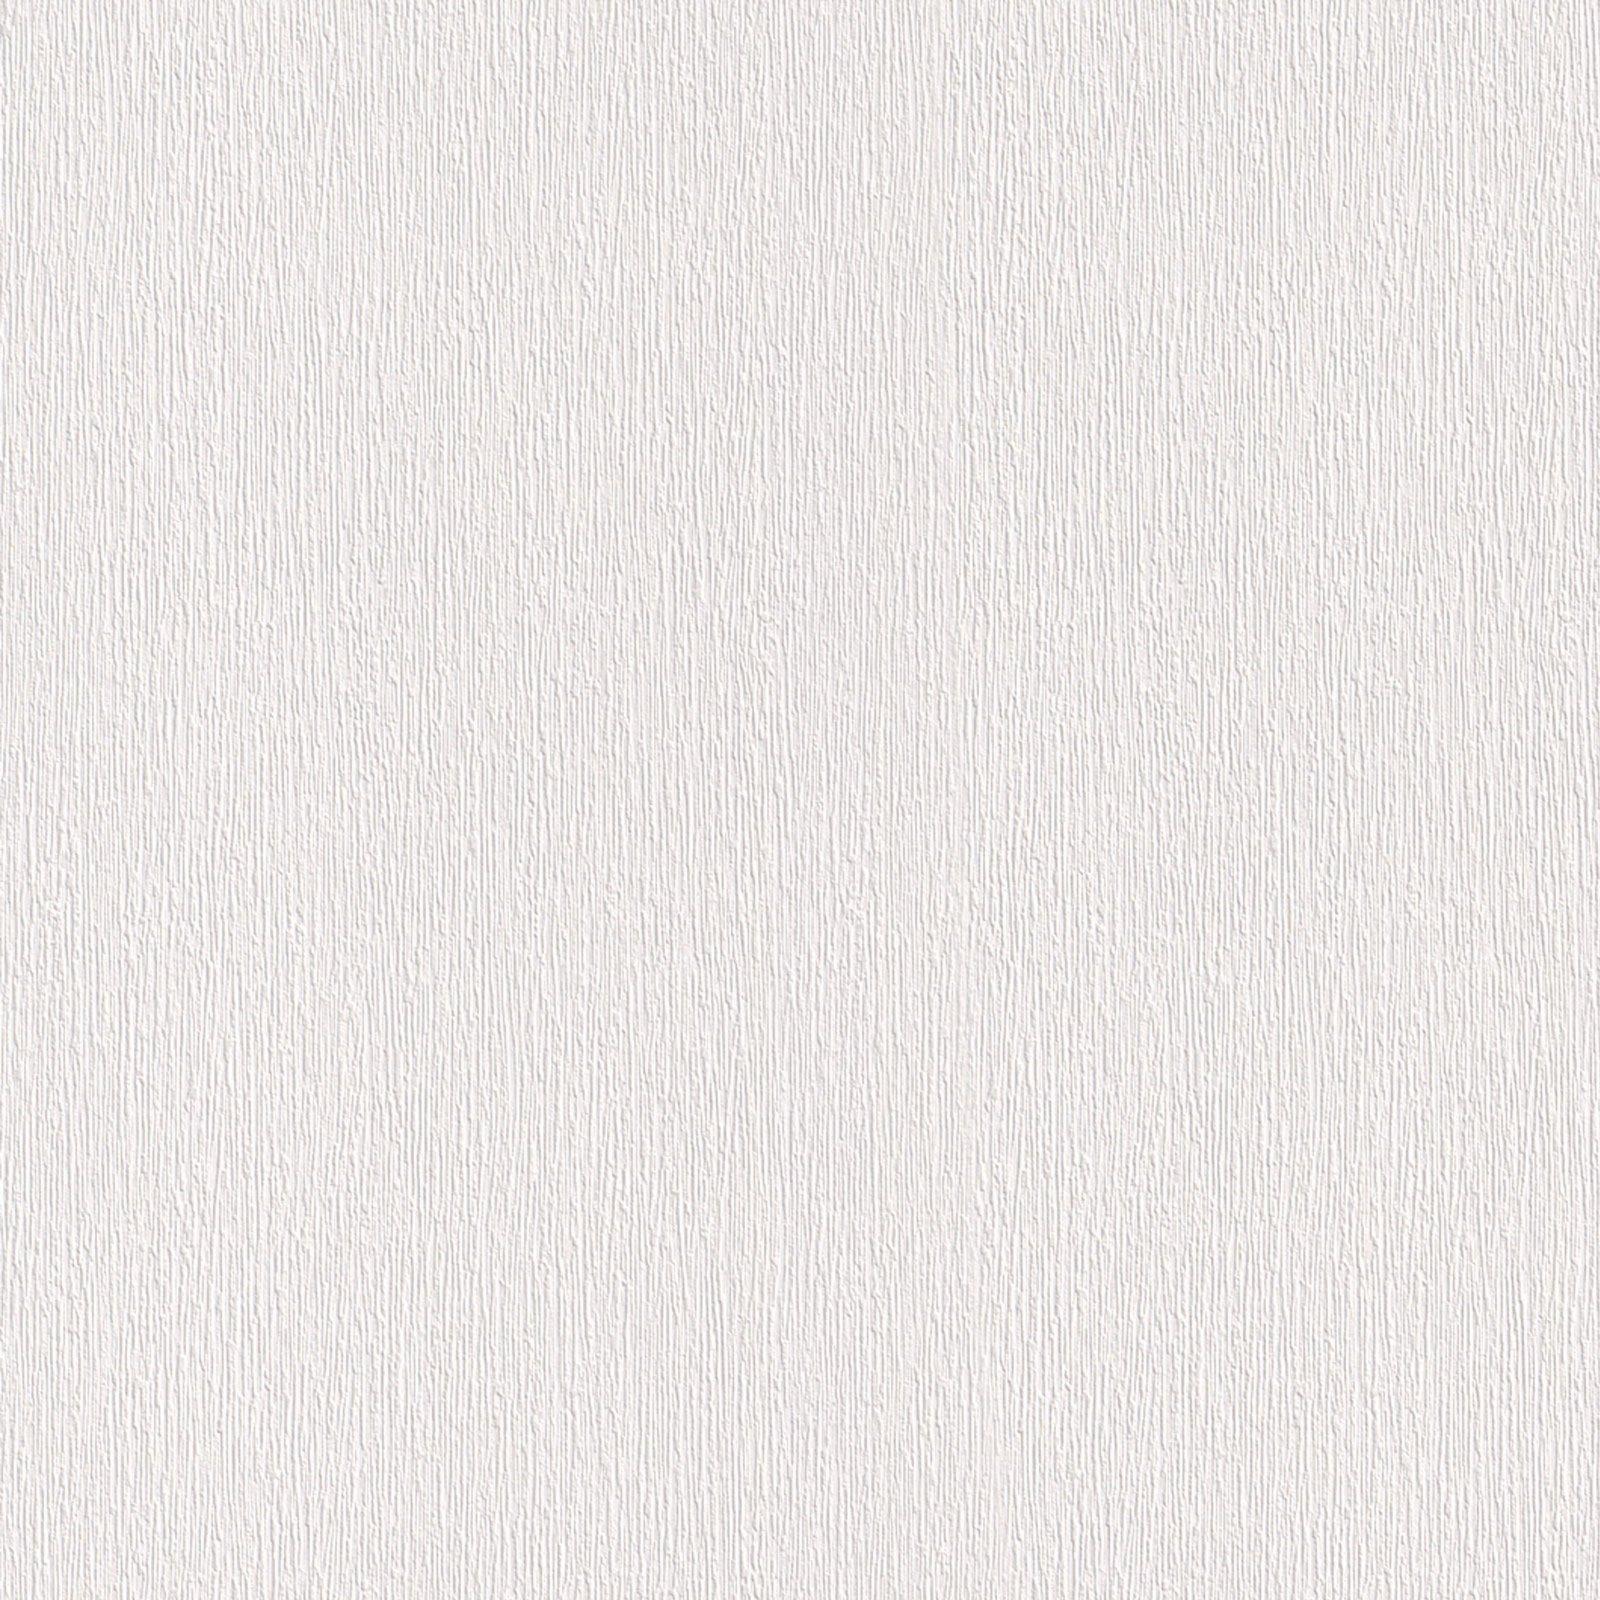 Vliestapete uni weiss 10 meter vliestapeten for Tapeten roller